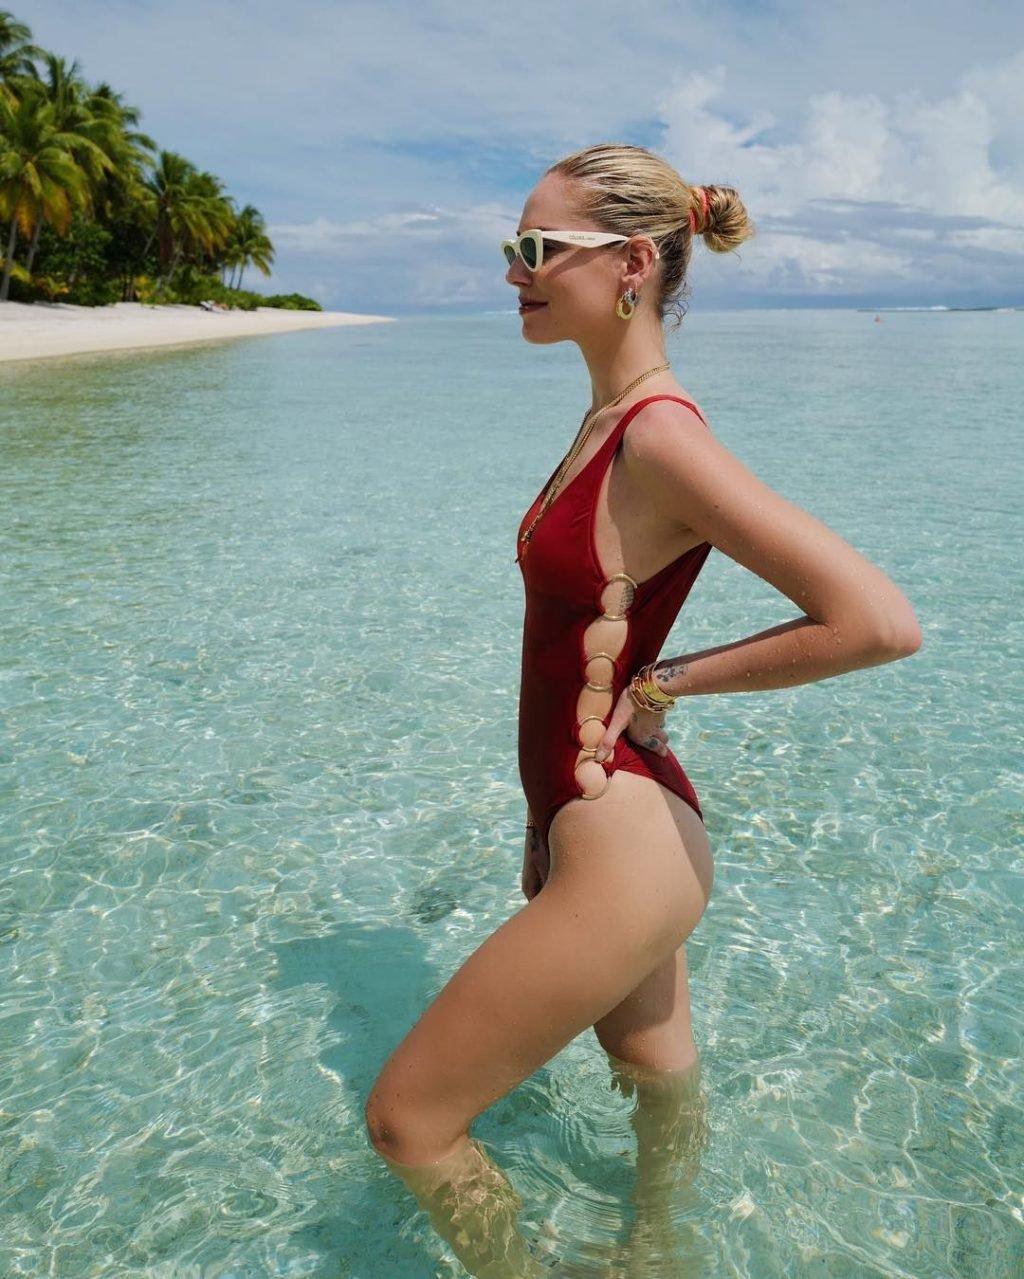 Chiara Ferragni Nude & Sexy (78 Photos)